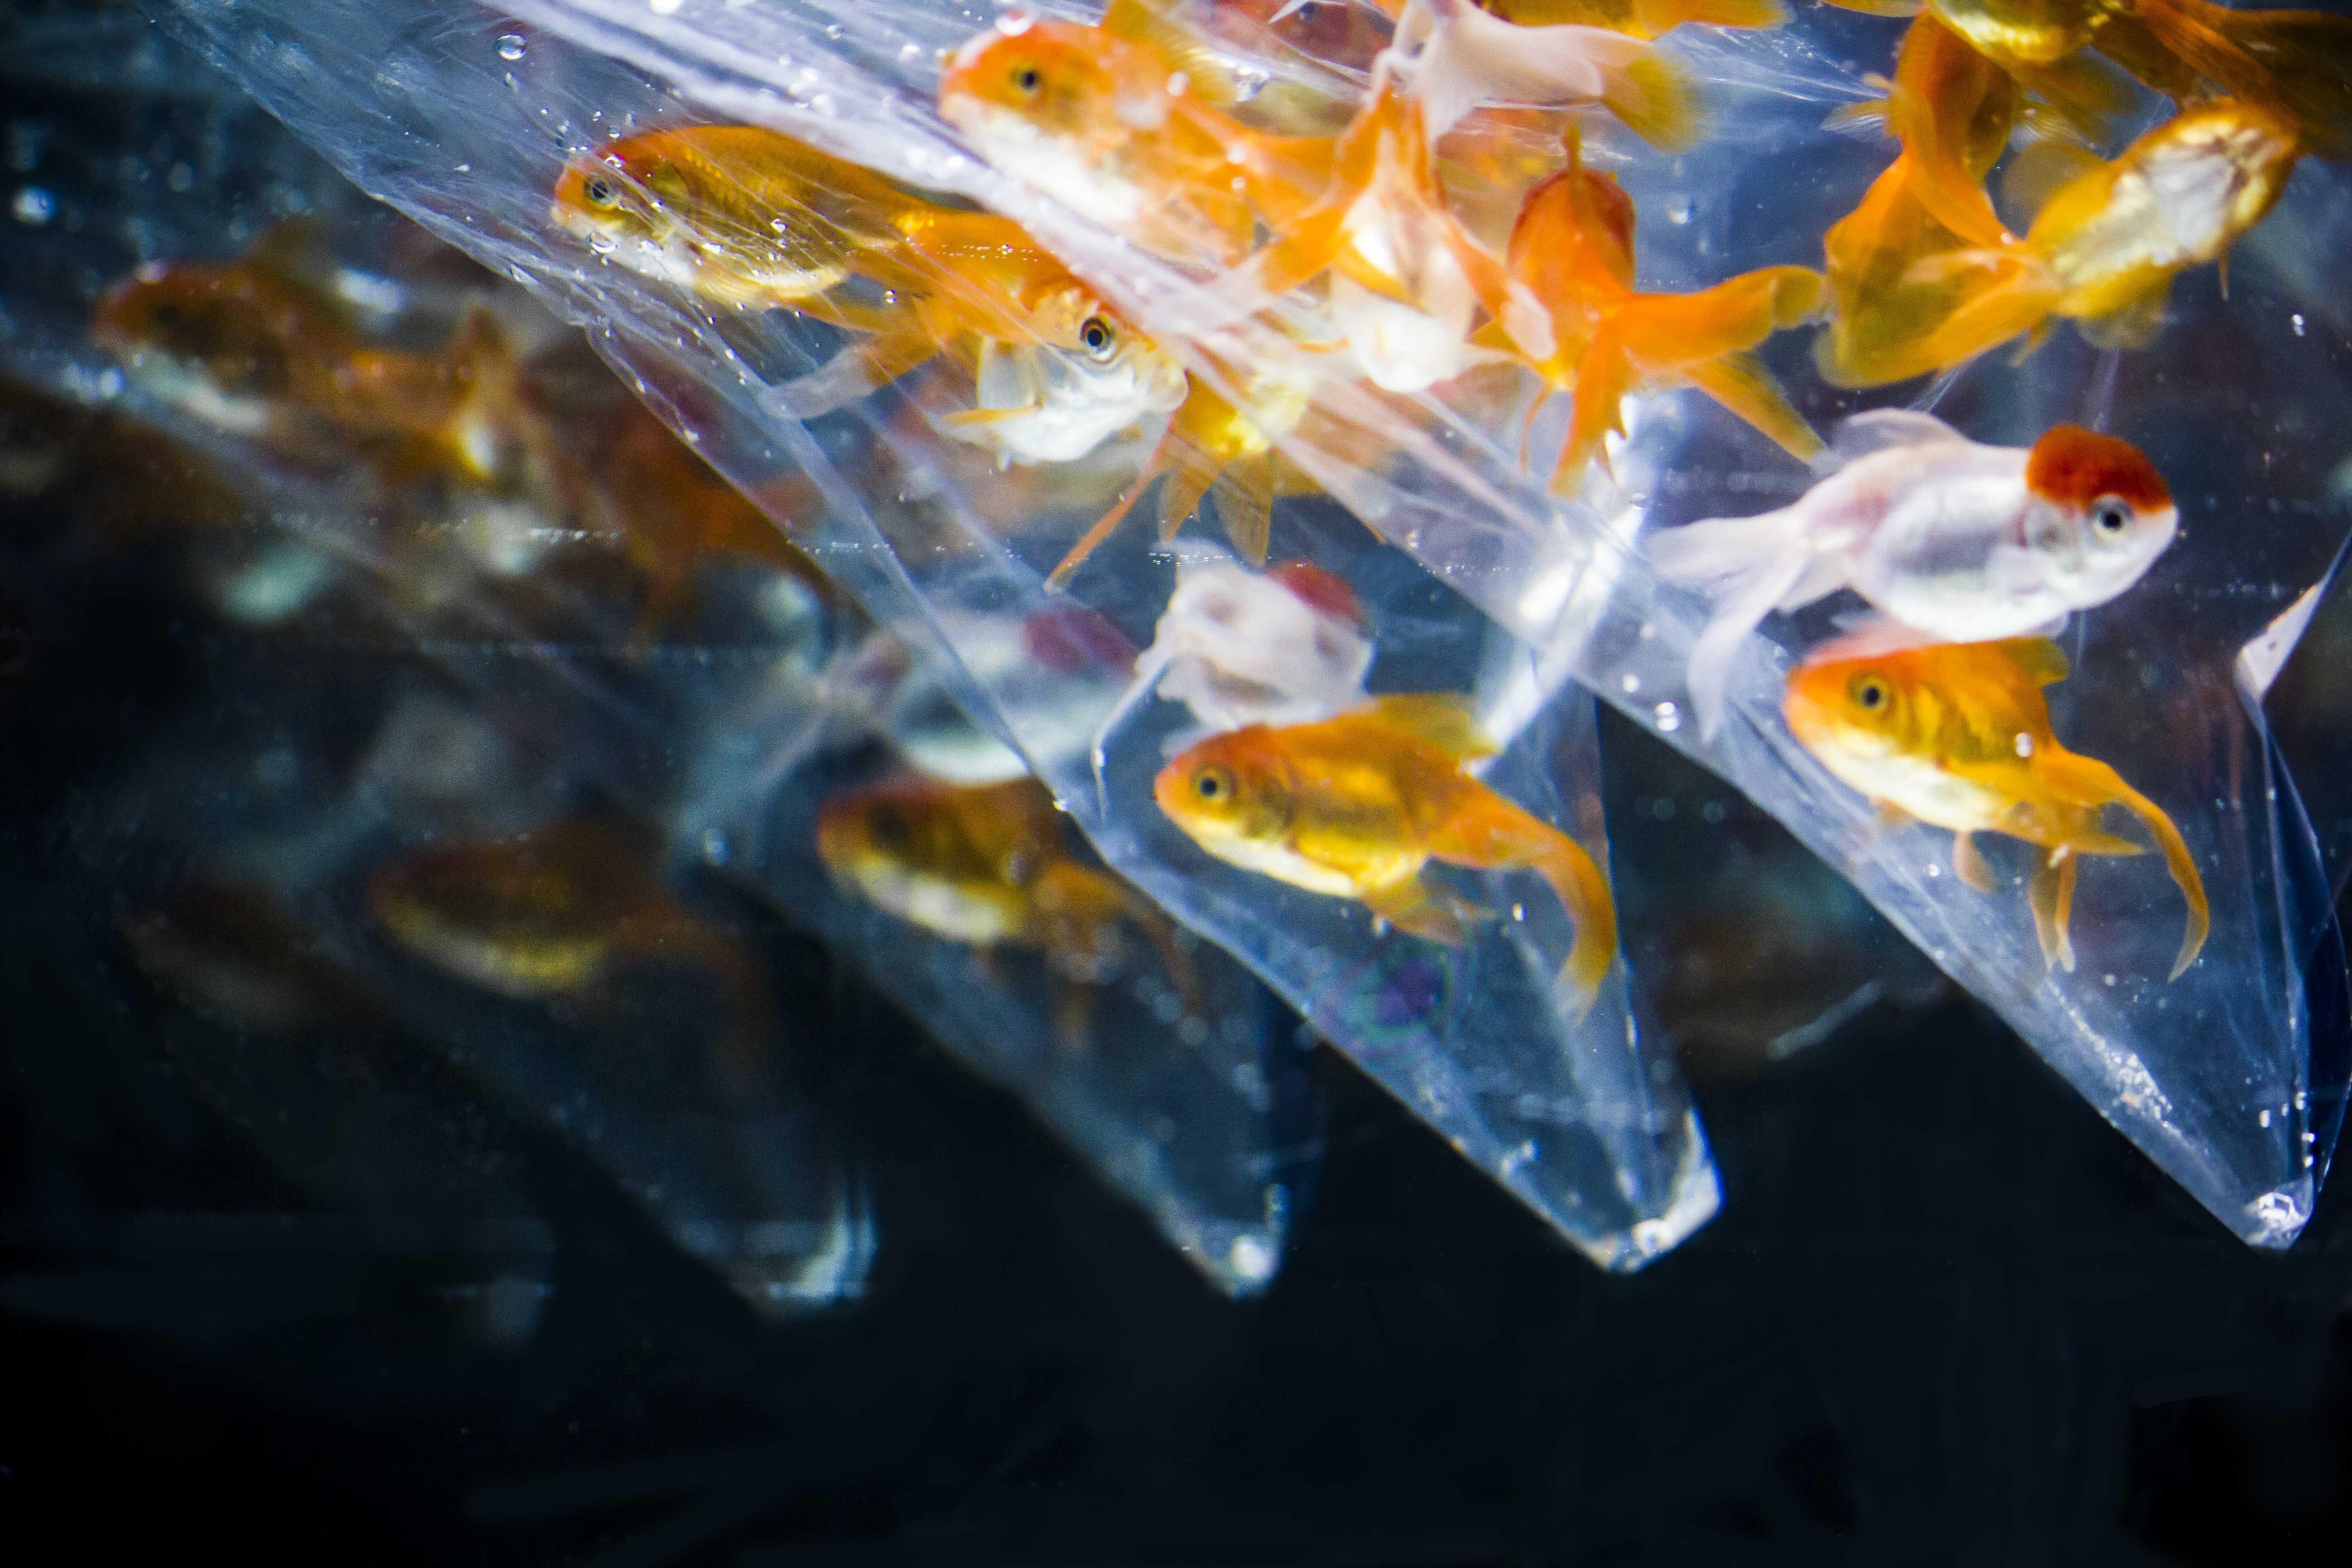 school of goldfish inside clear plastic bags